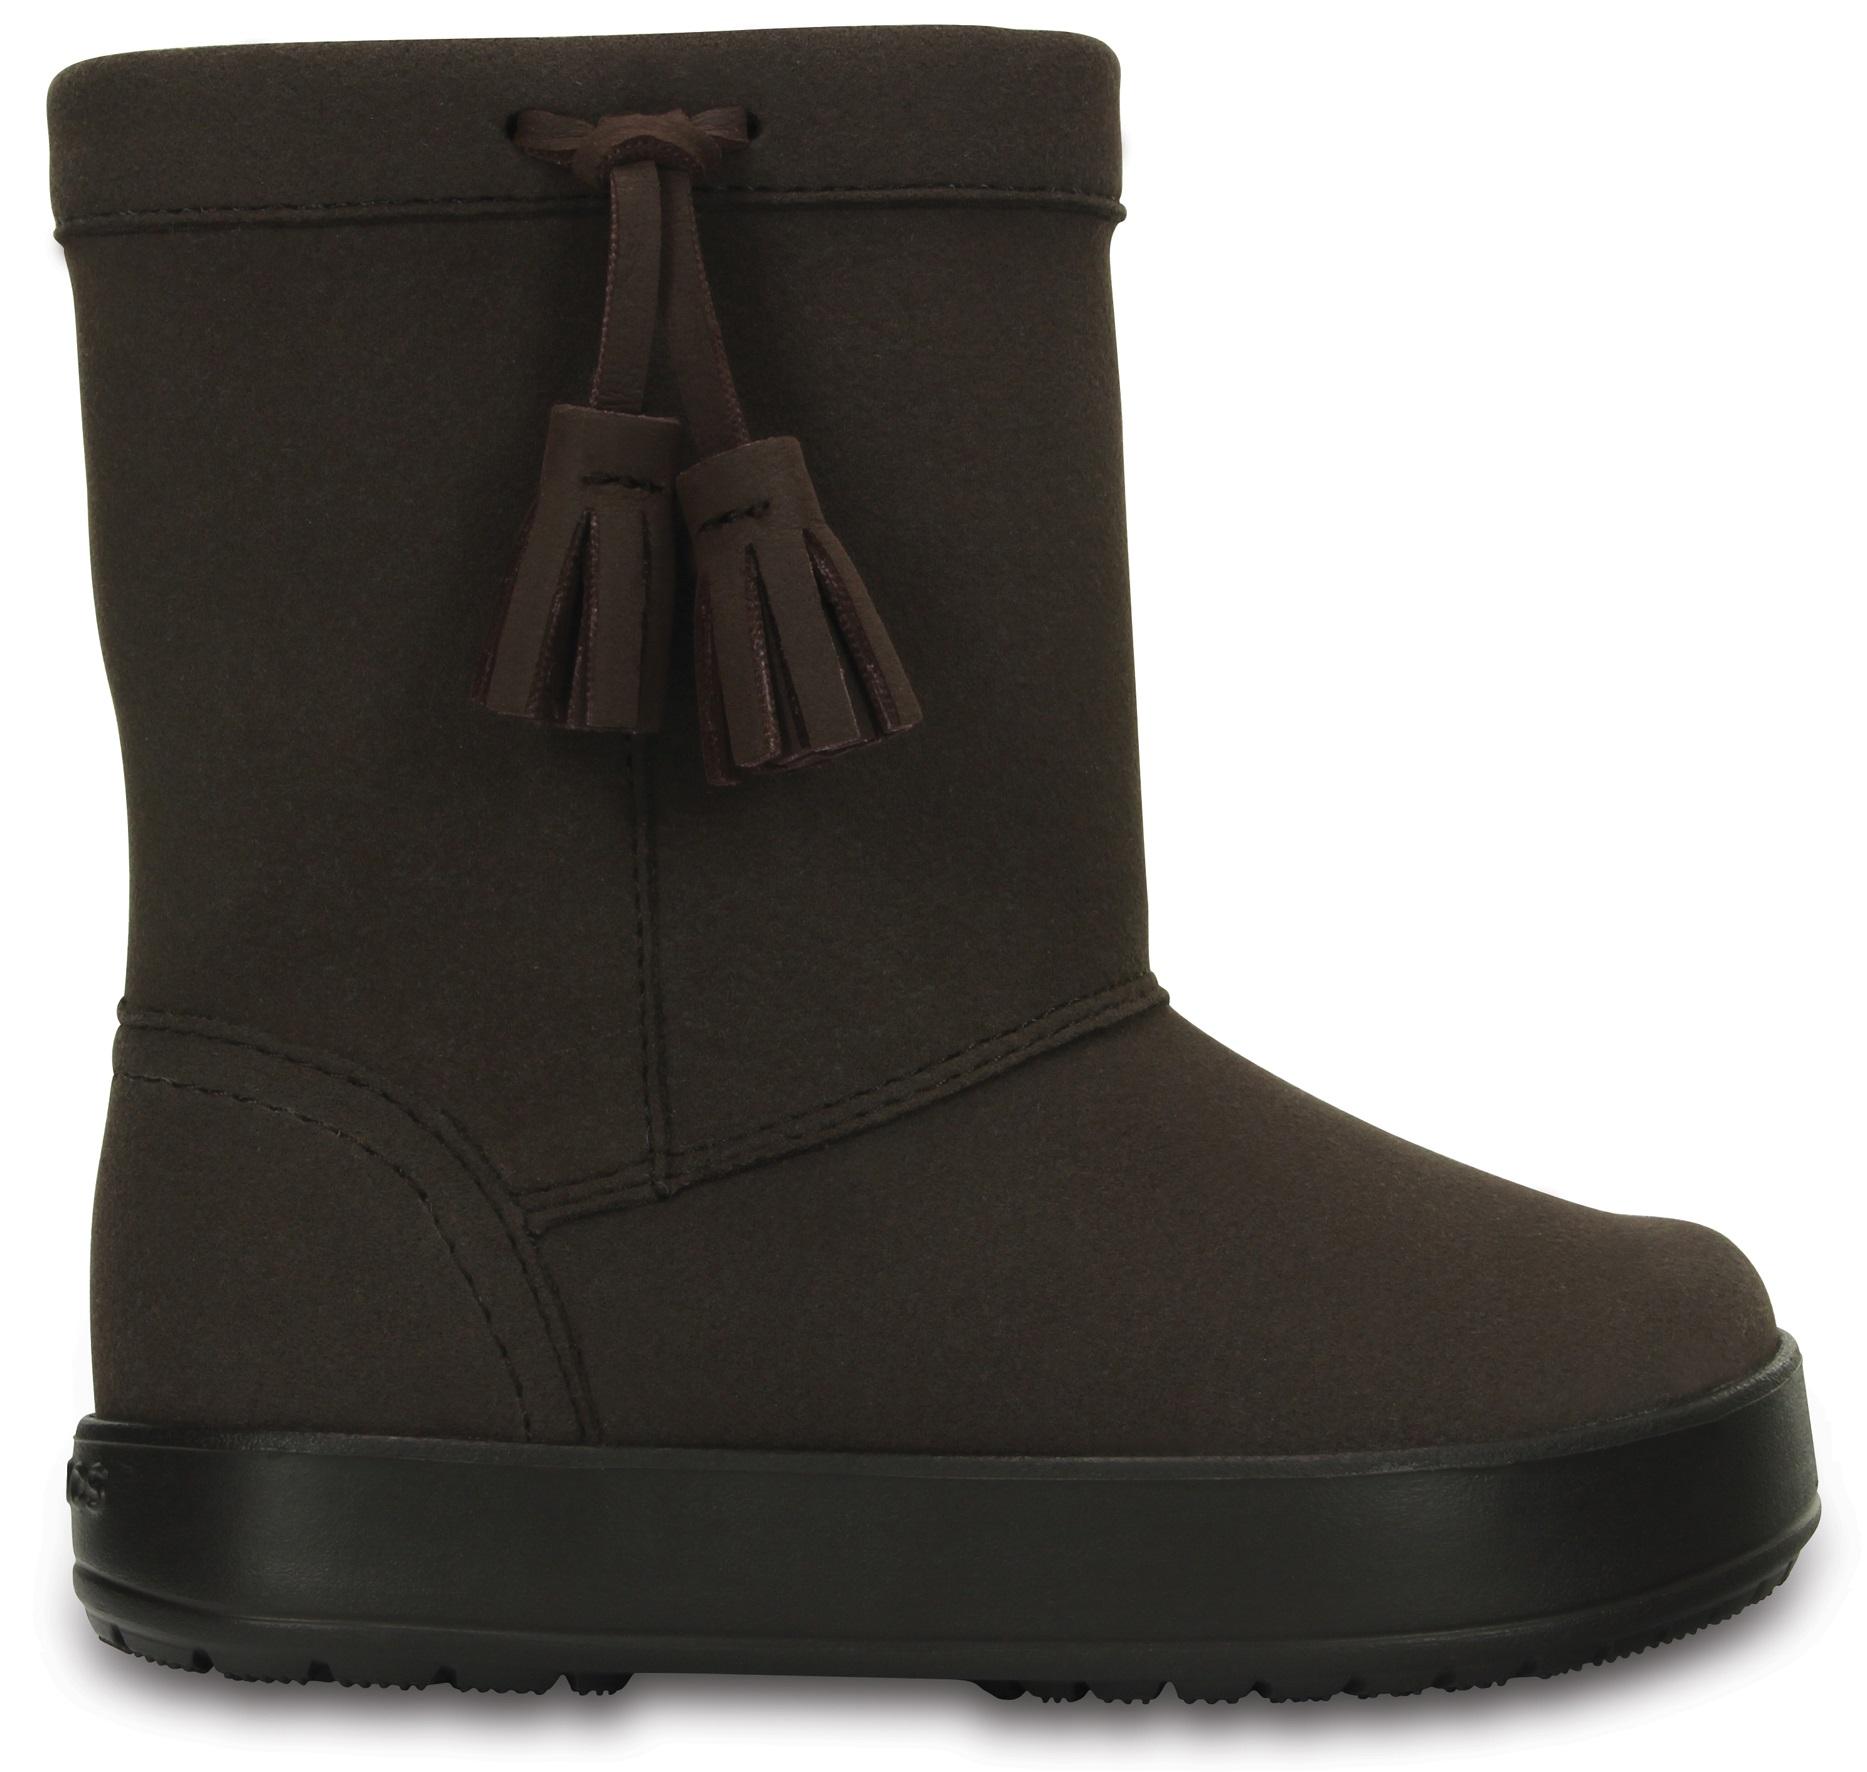 Crocs Lodgepoint boot Kids Espresso Hnědá 29-30